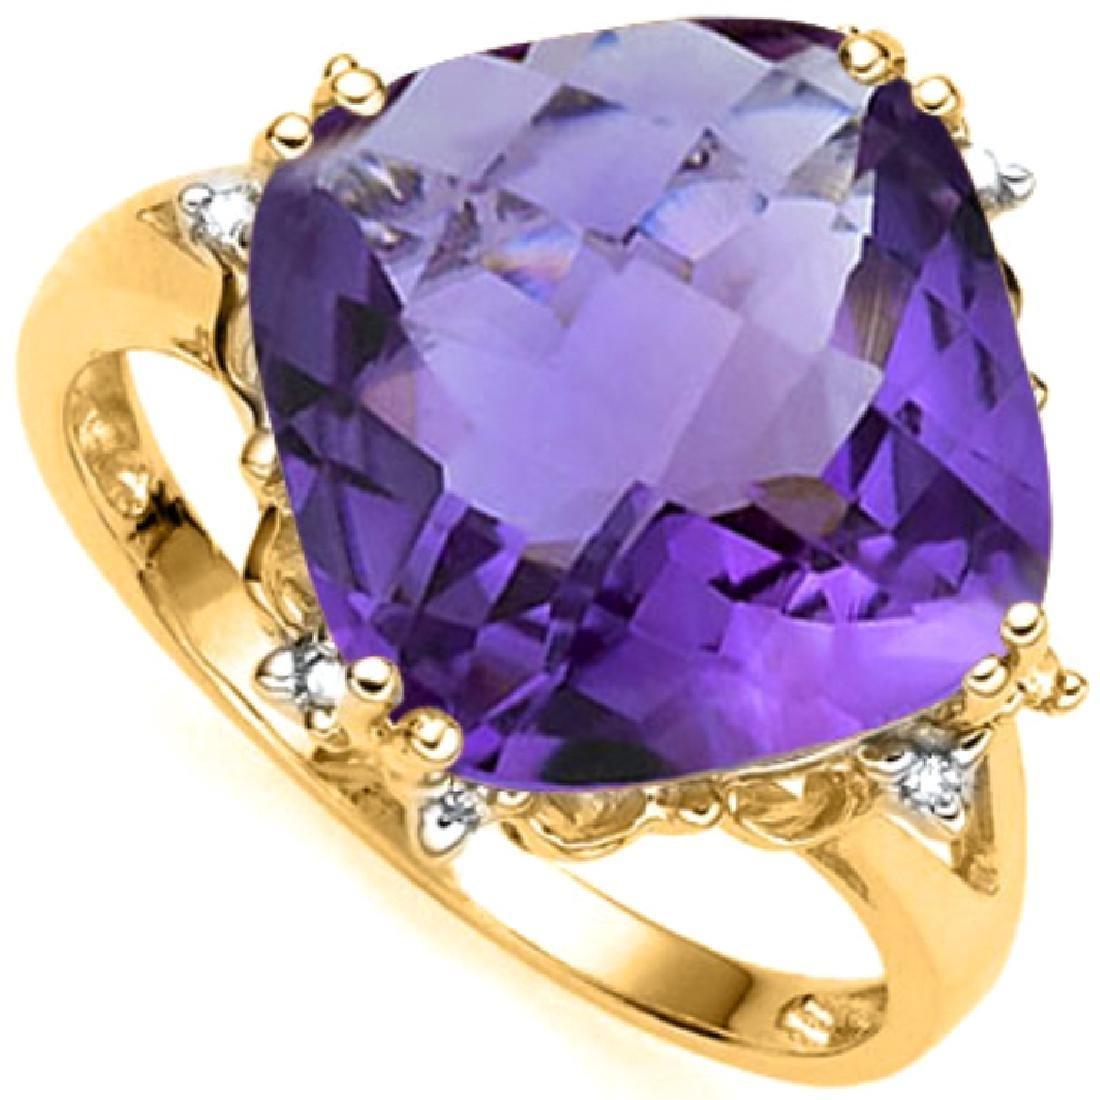 STUNNING 10K GOLD BRIGHT 6CT AMETHYST/DIAMOND RING